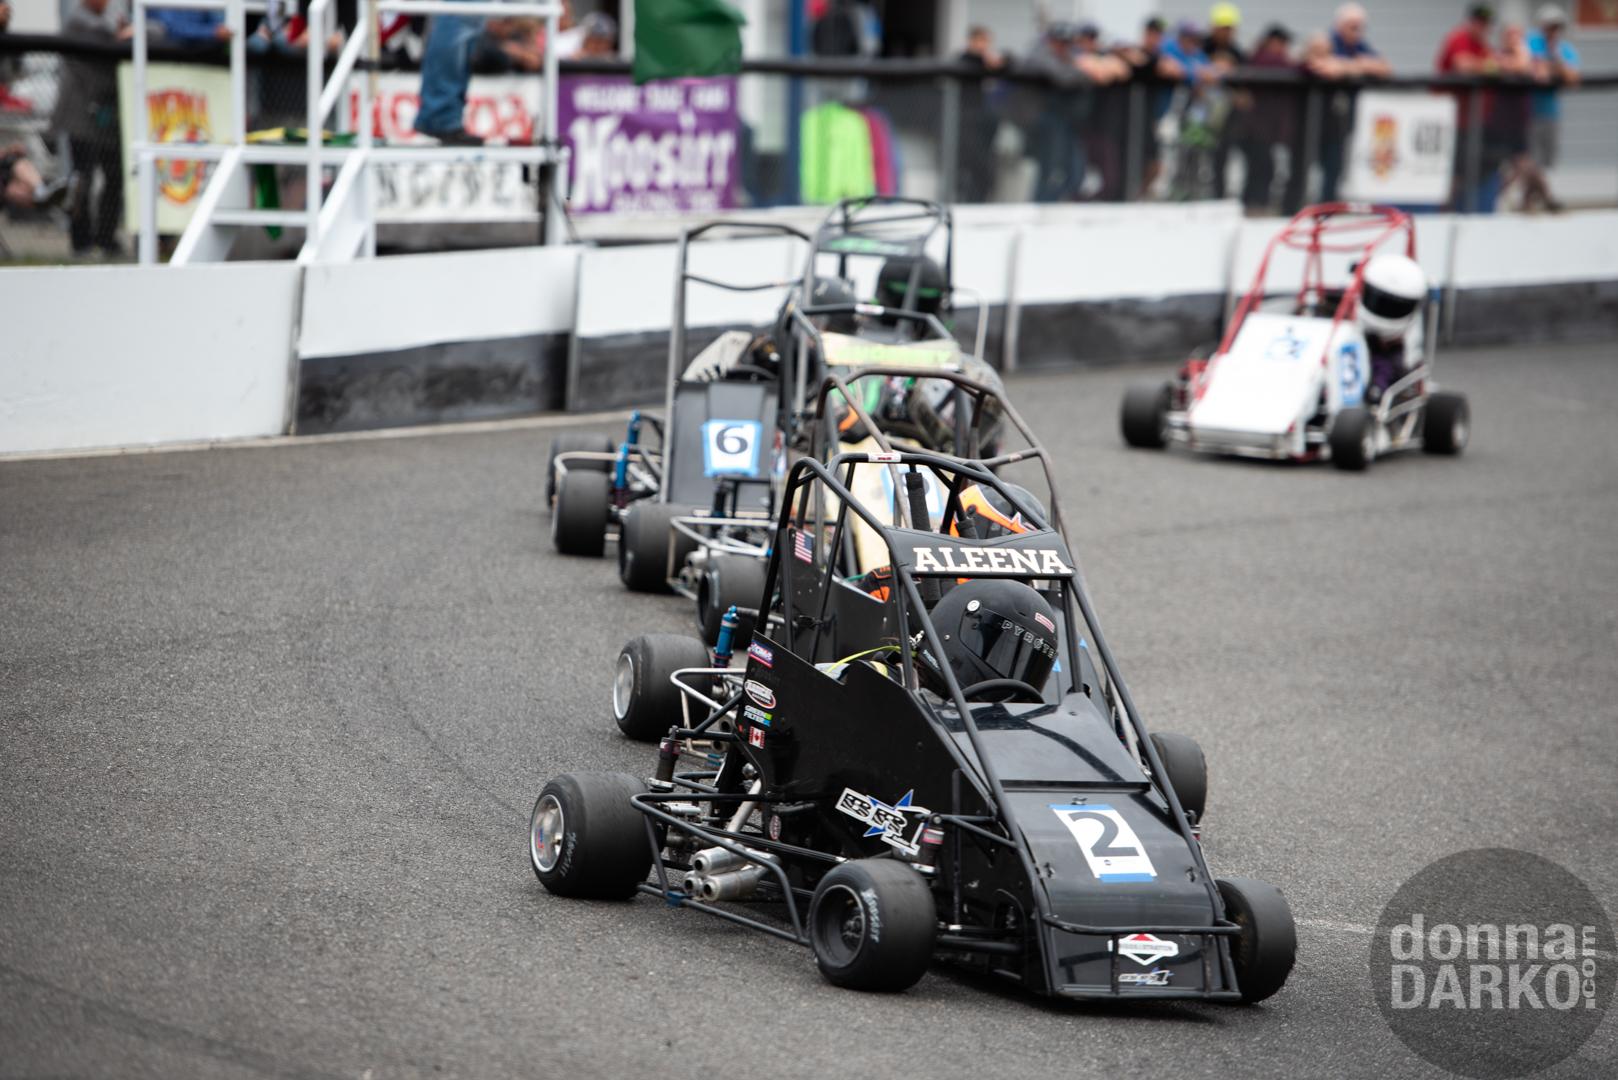 QWMA (Racing) 8-11-2019 DSC_6819.jpg